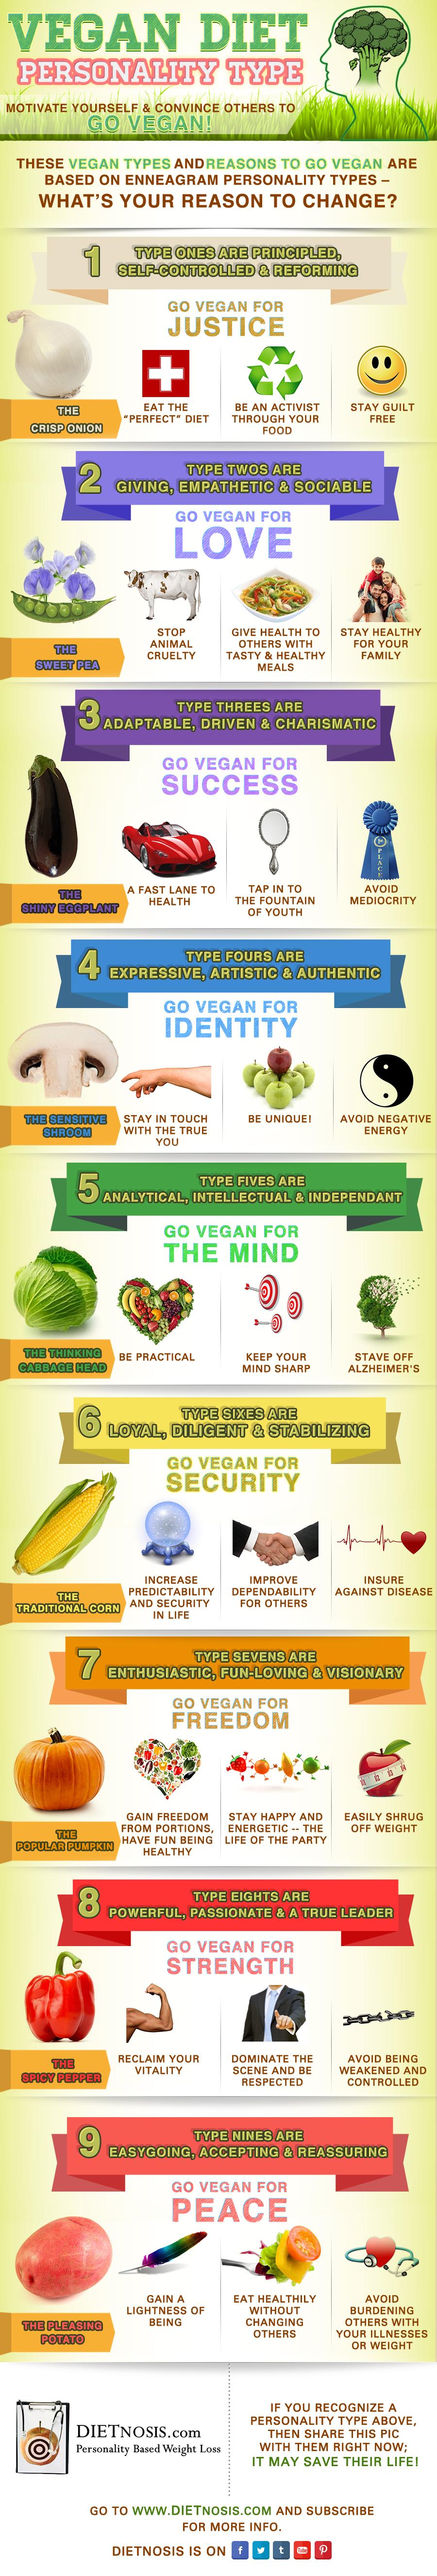 Vegan diet Personality Types